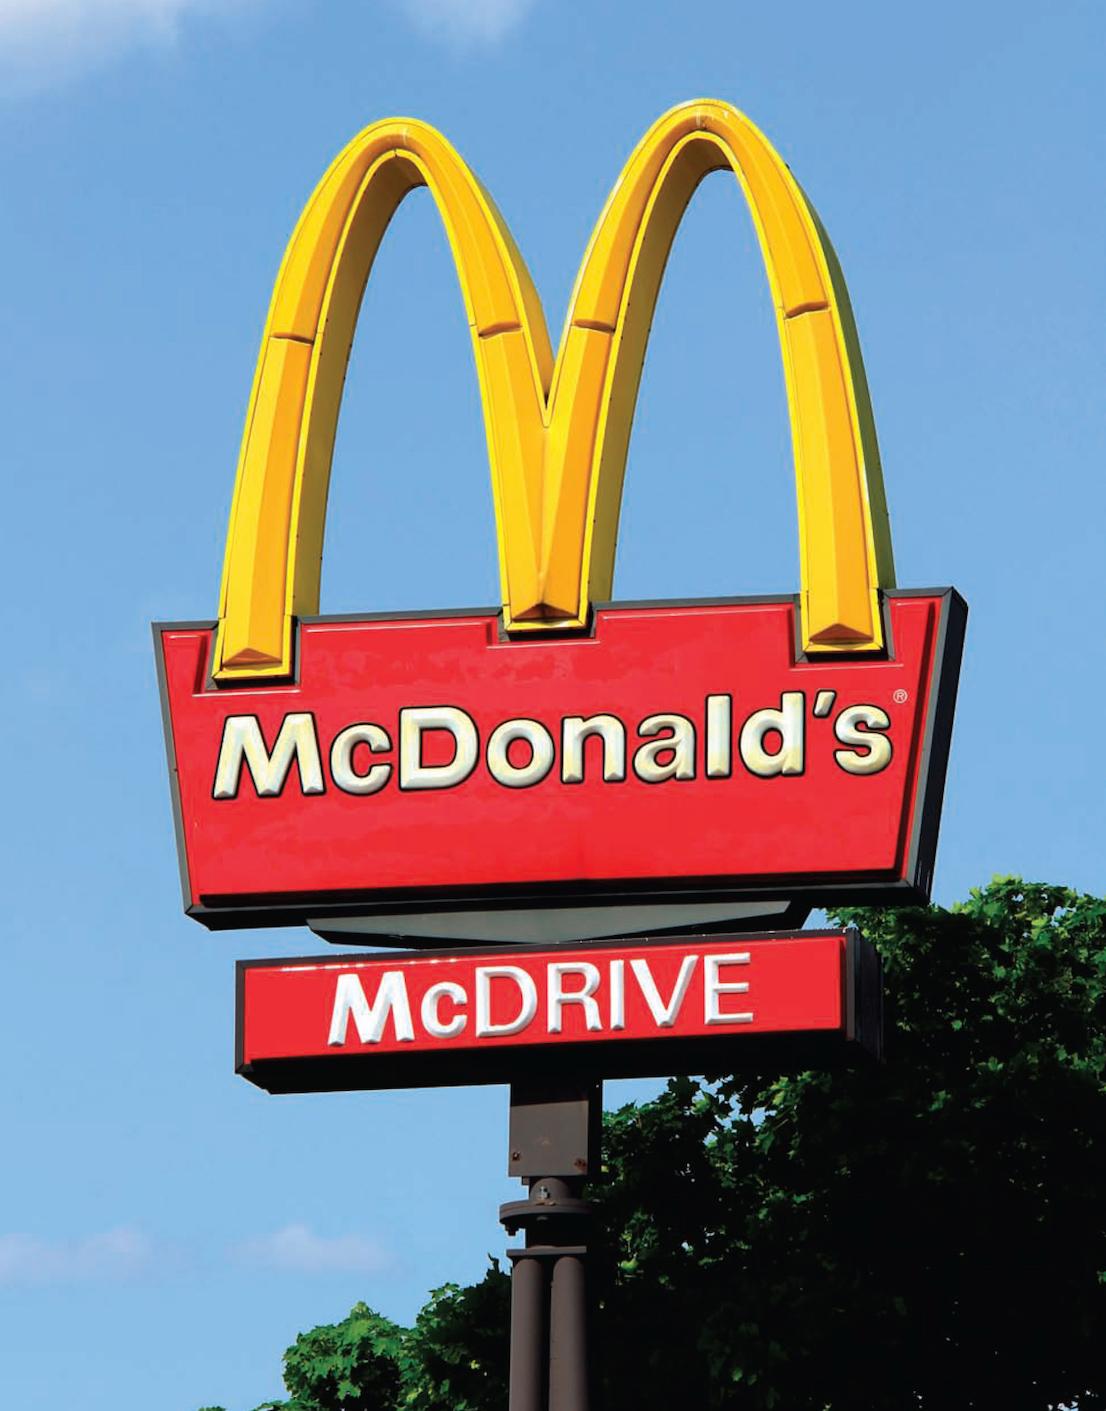 Marchio McDonald's